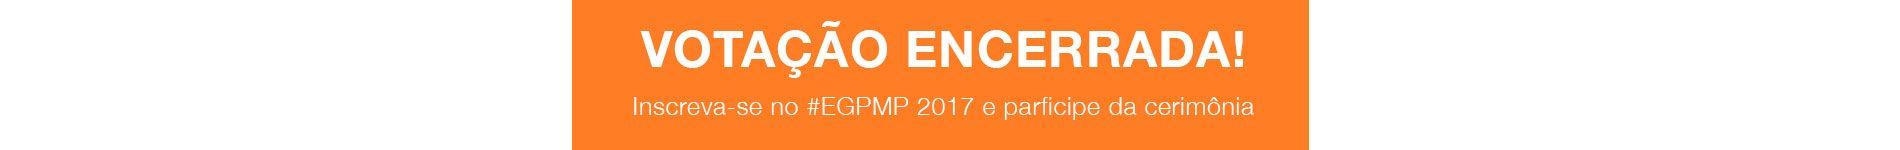 https://www.mestregp.com.br/wp-content/uploads/2017/07/botao_voteencerrada-1900x150.jpg